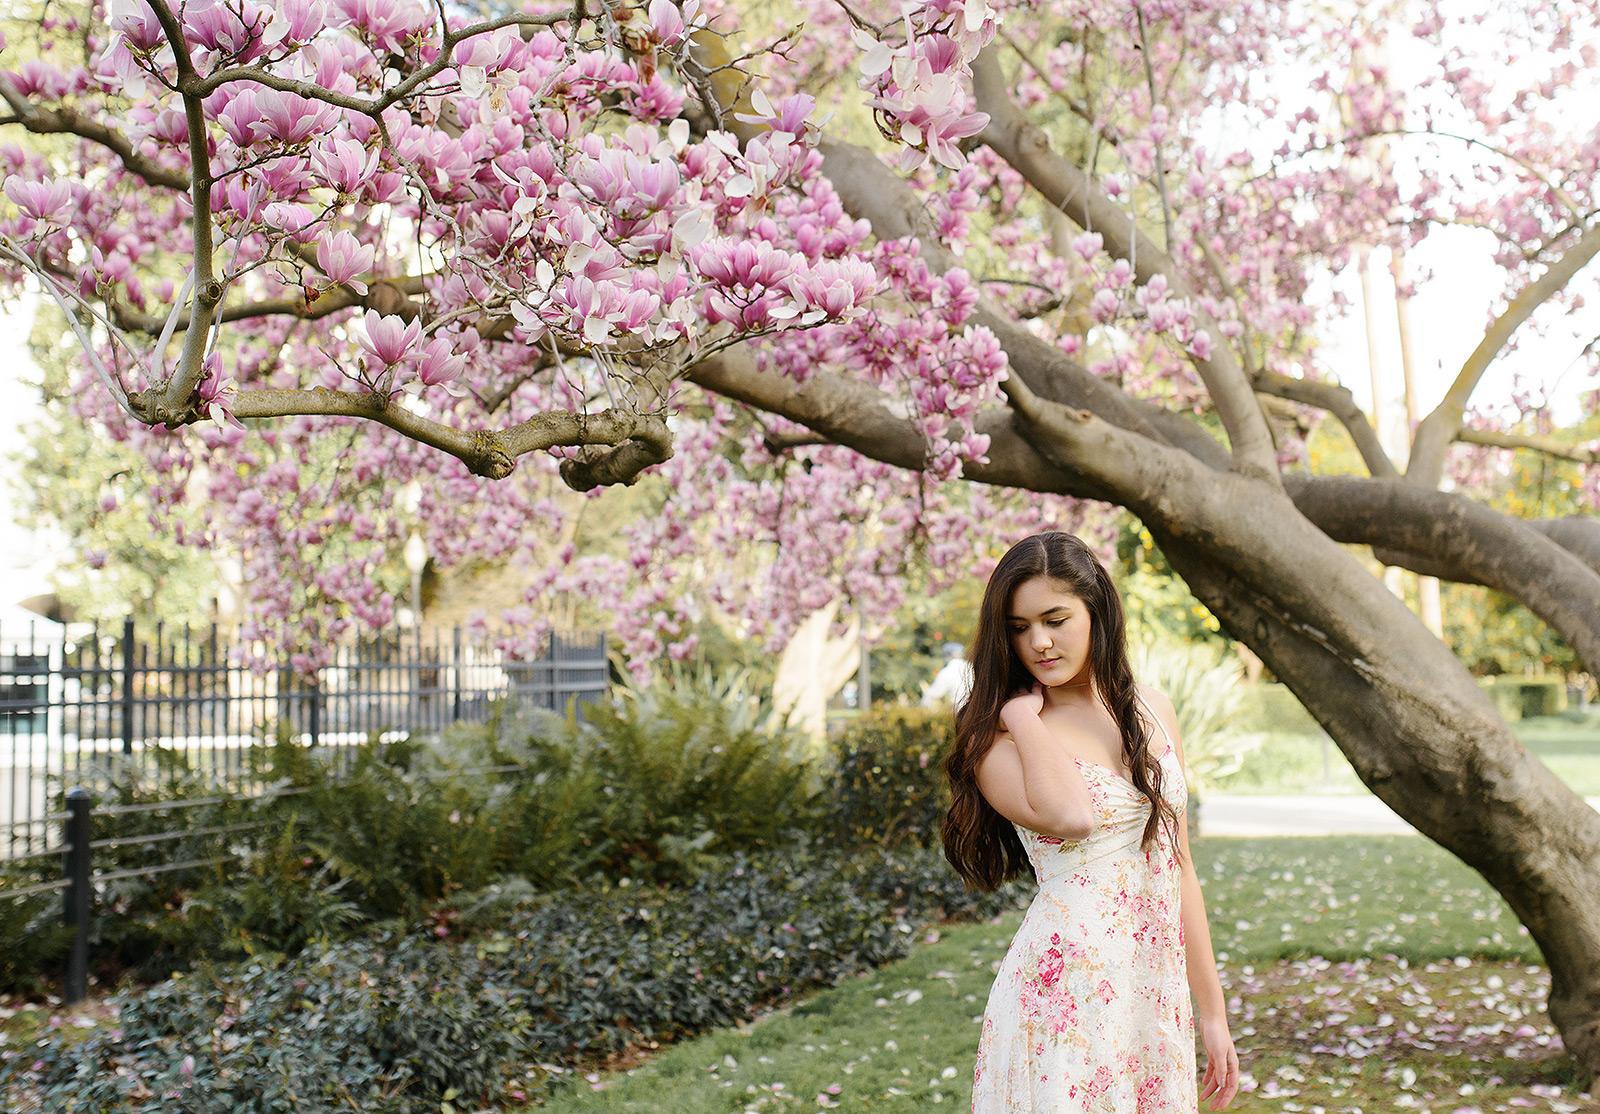 senior portraits under a pink magnolia tulip tree and floral dress